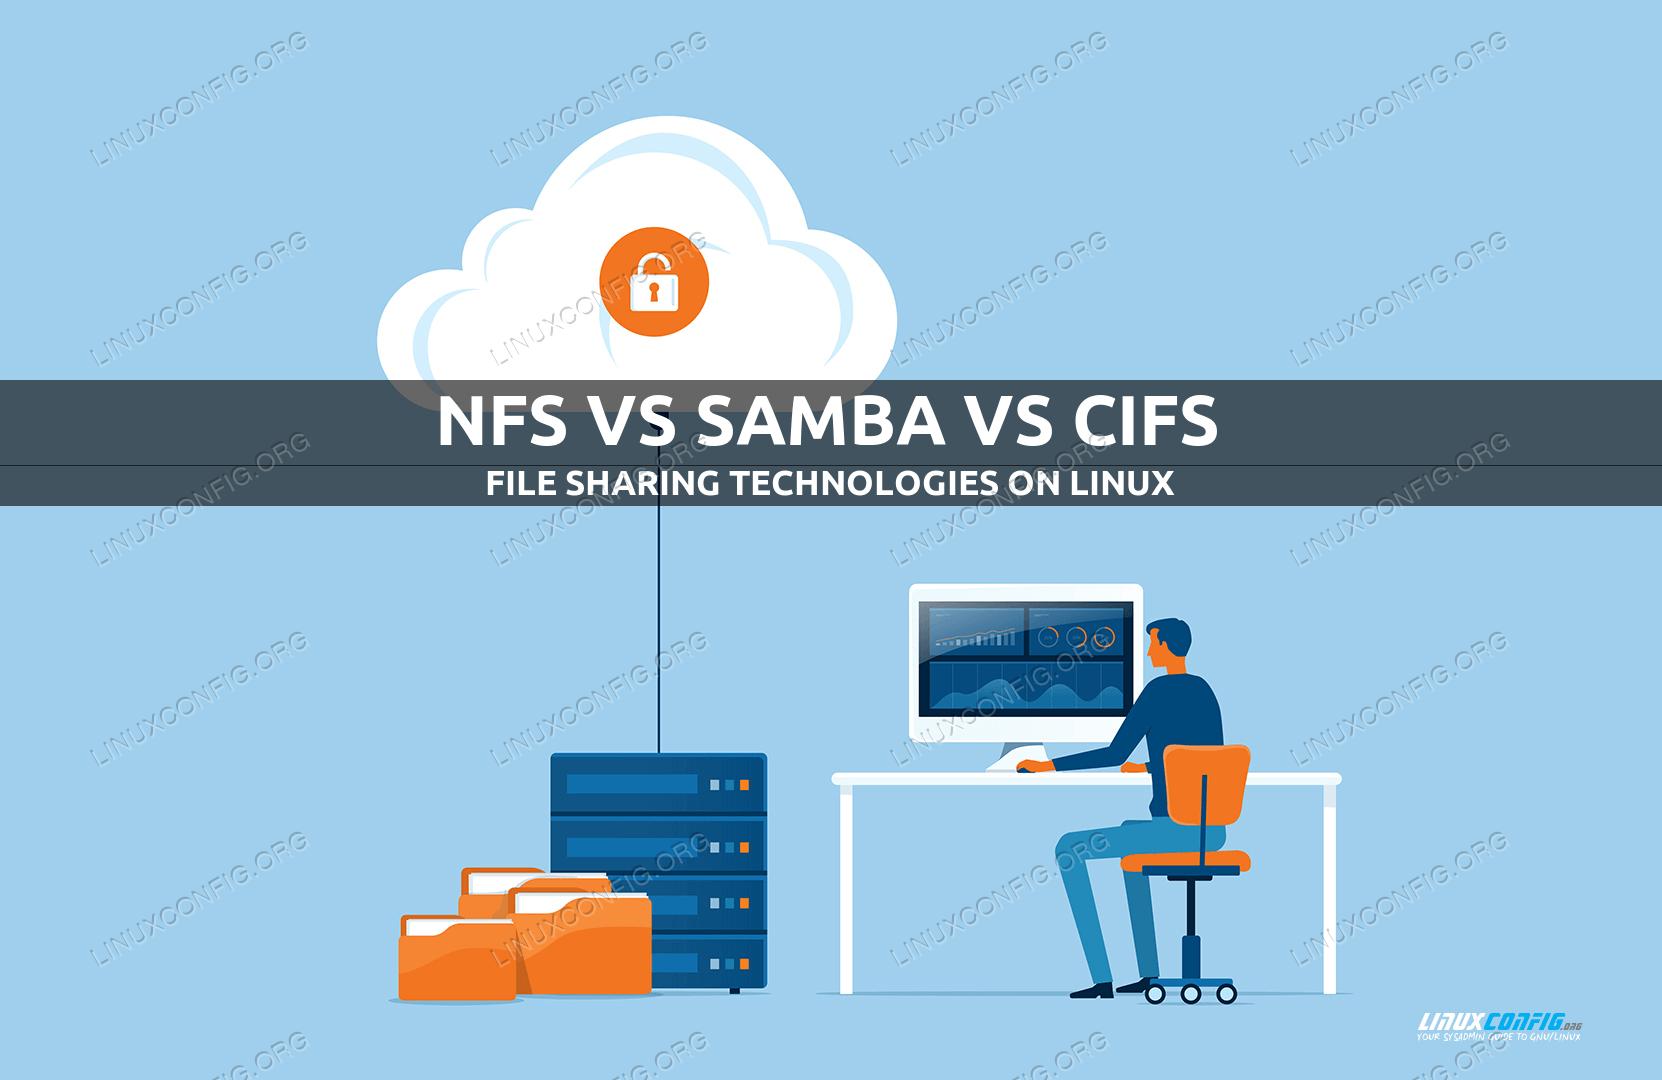 NFS vs SAMBA vs CIFS